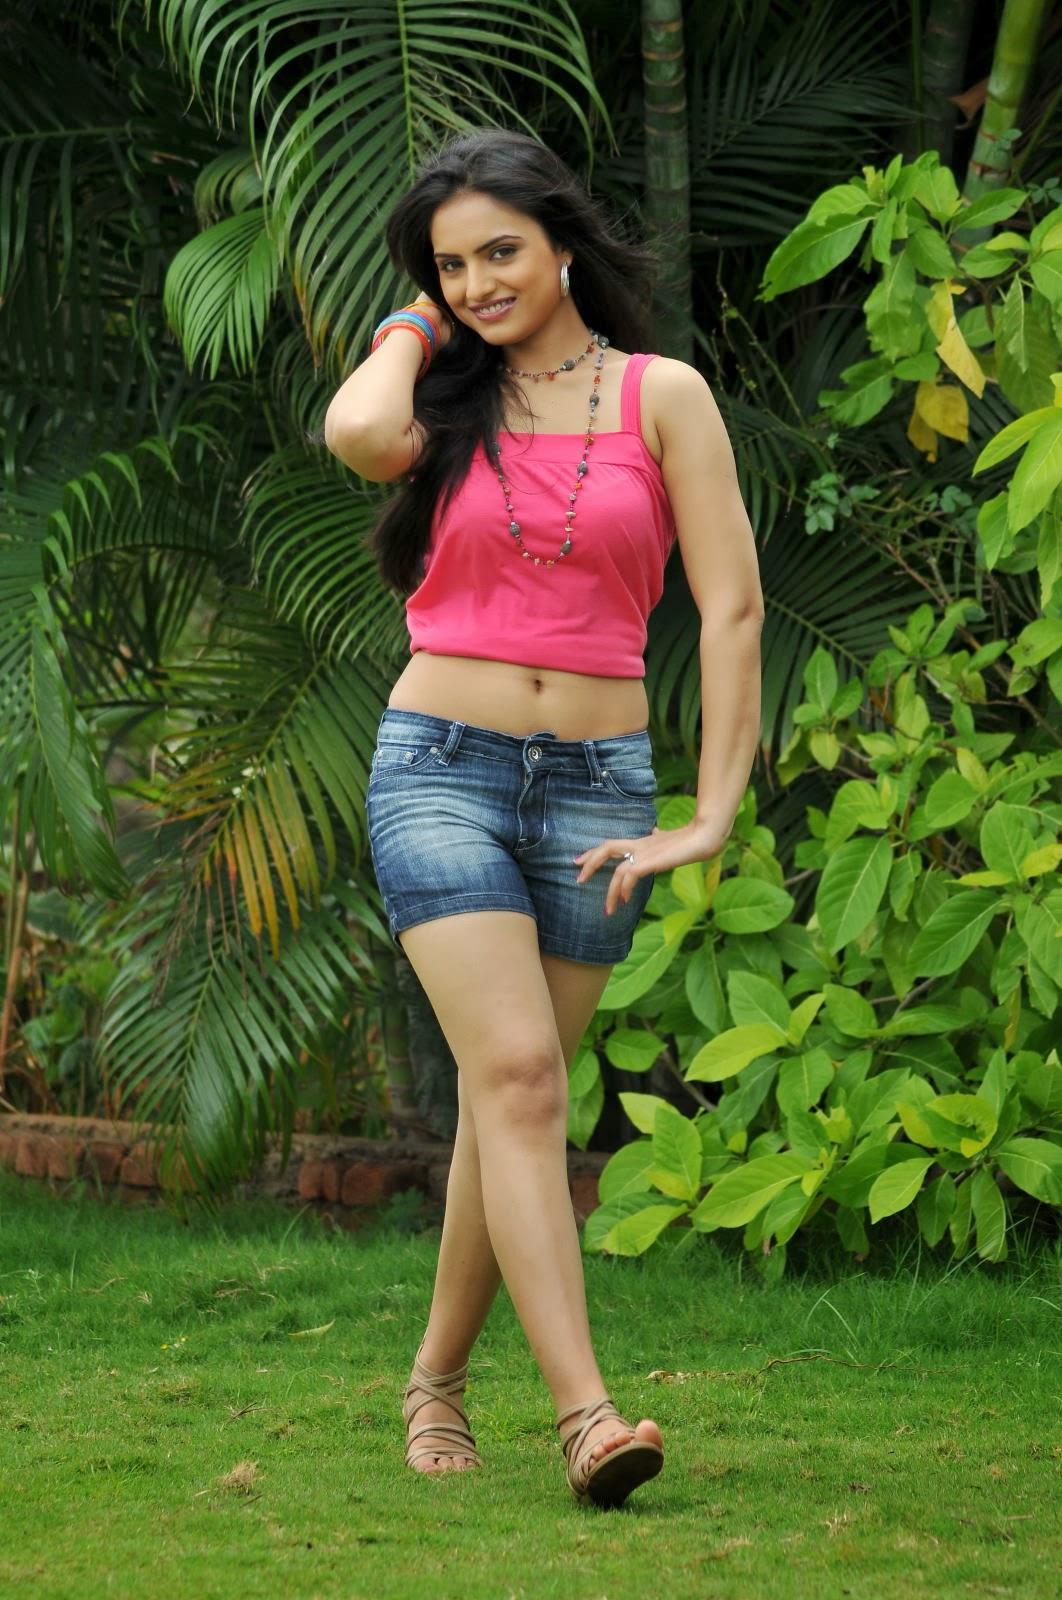 Gorgeous Ritu kaur hot photo gallery in denim shorts